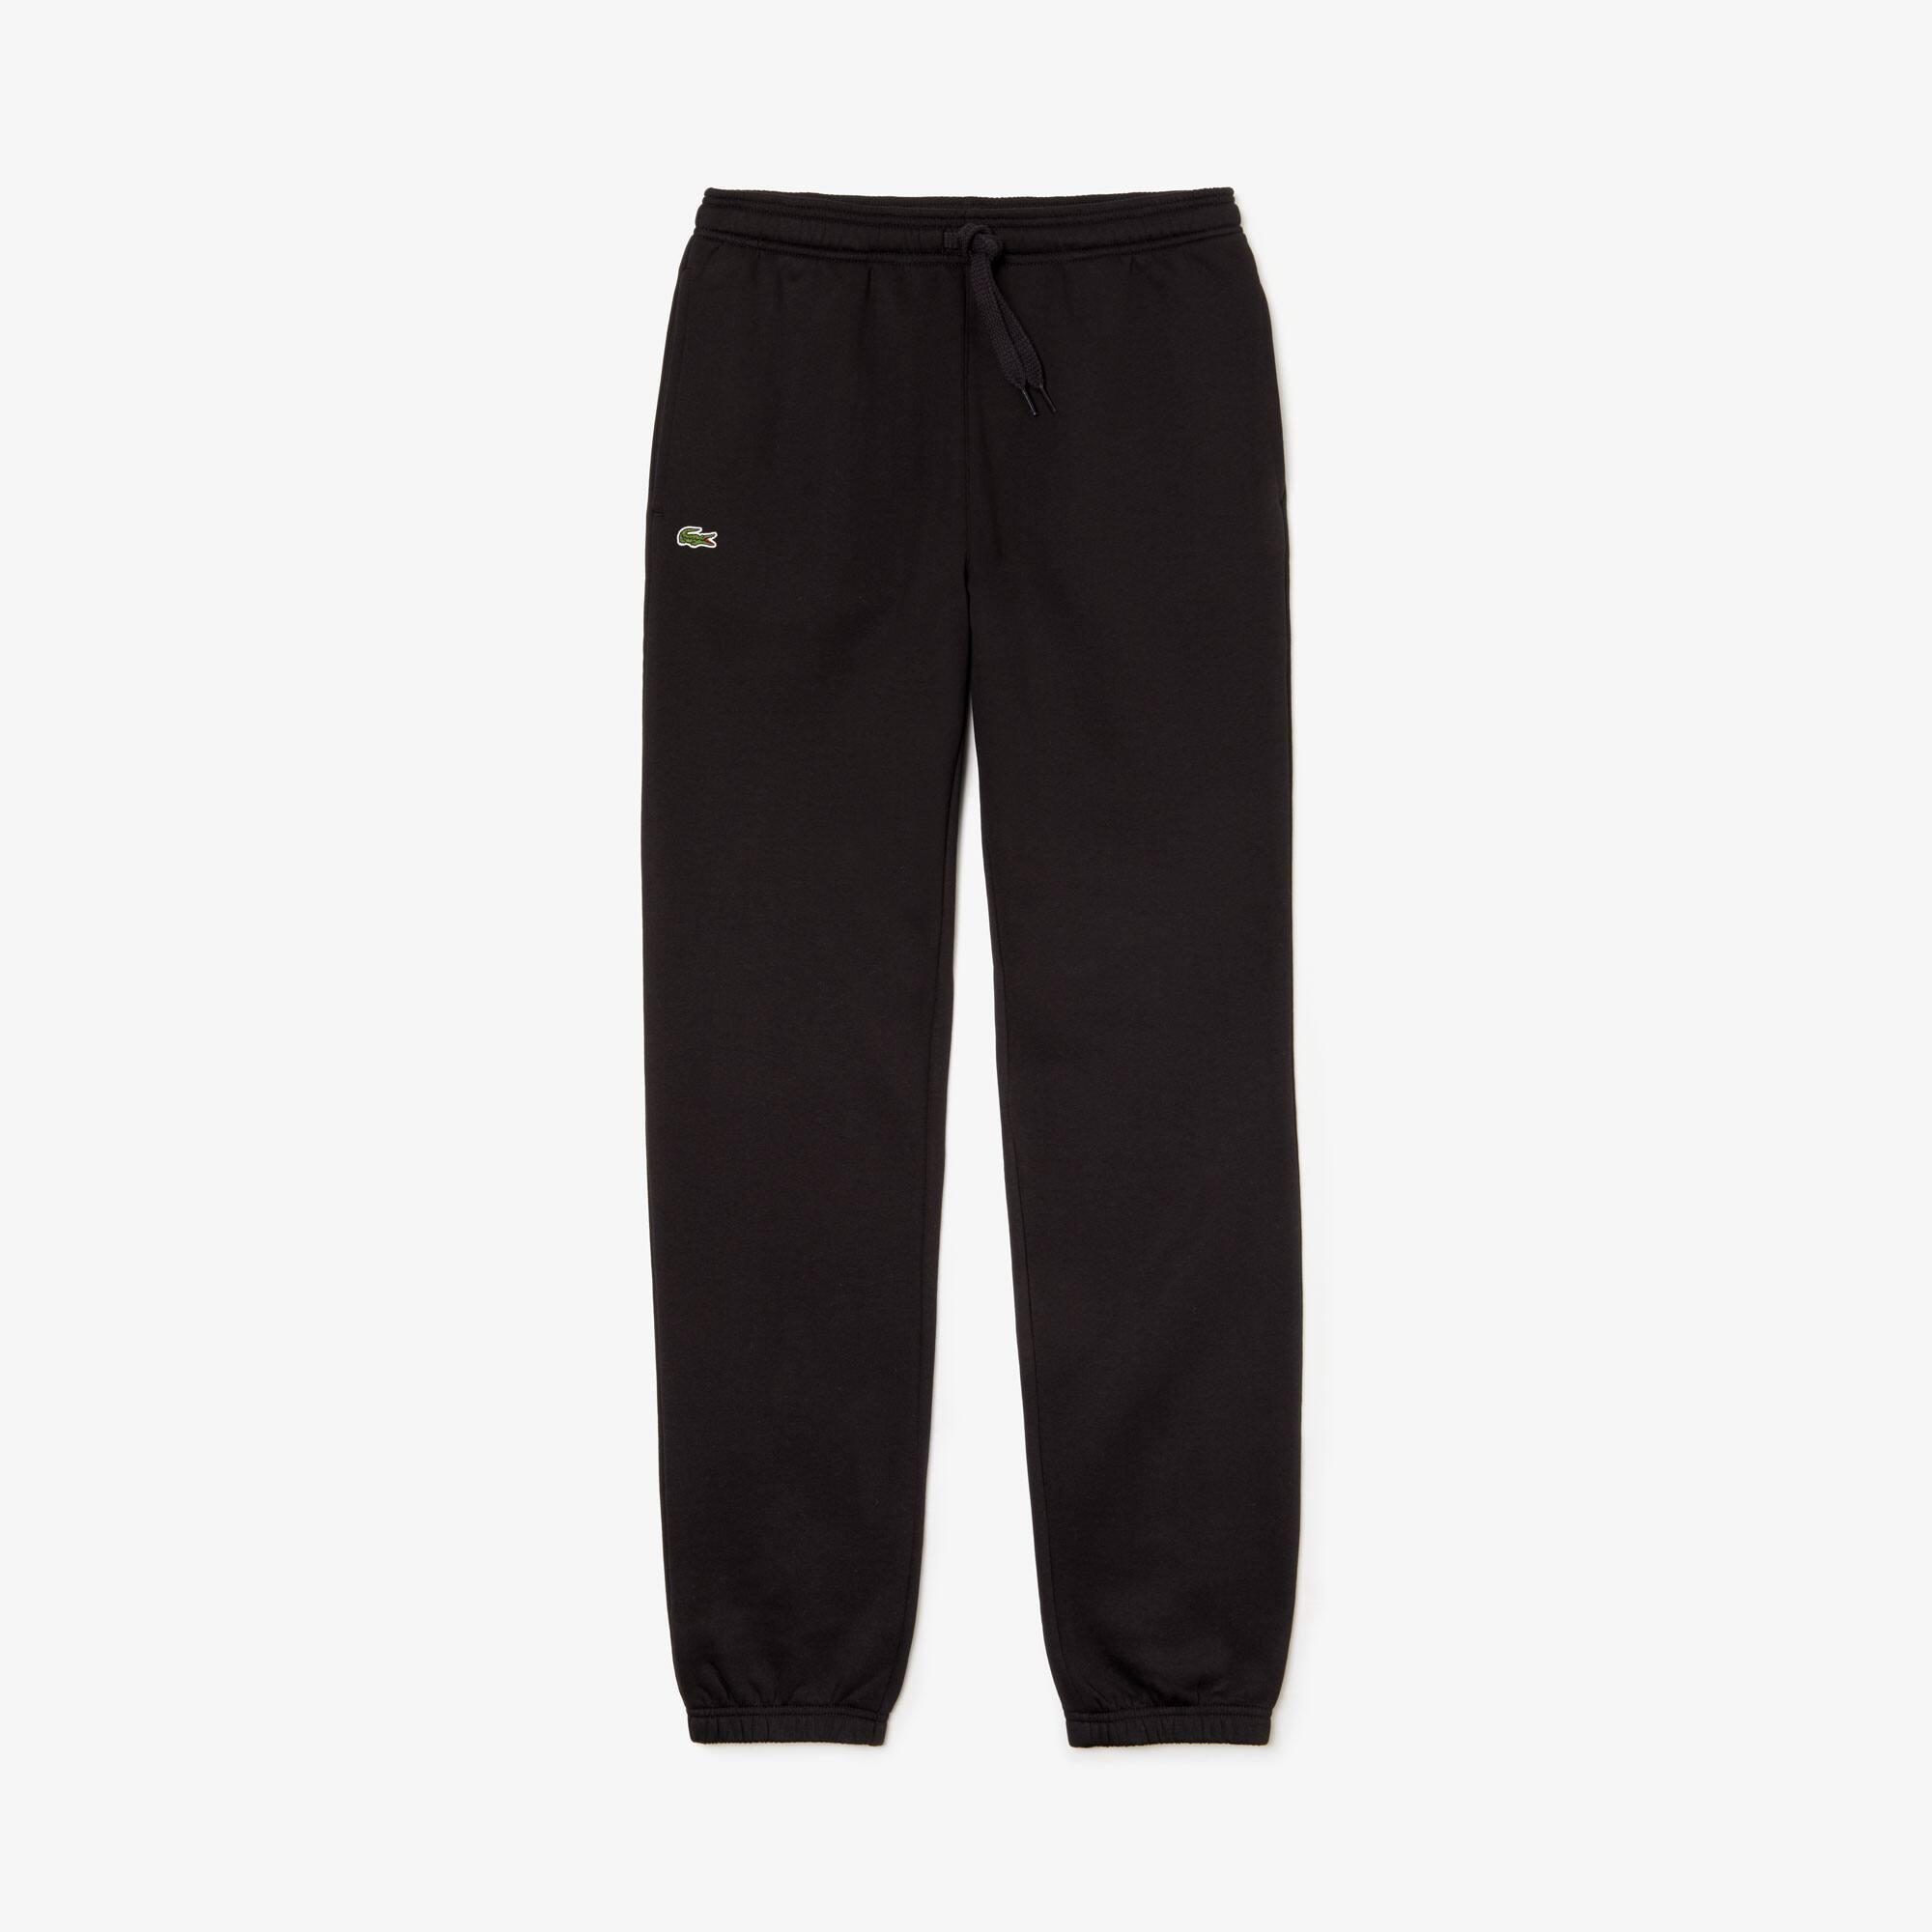 Pantaloni da ginnastica Lacoste SPORT in pile in tinta unita